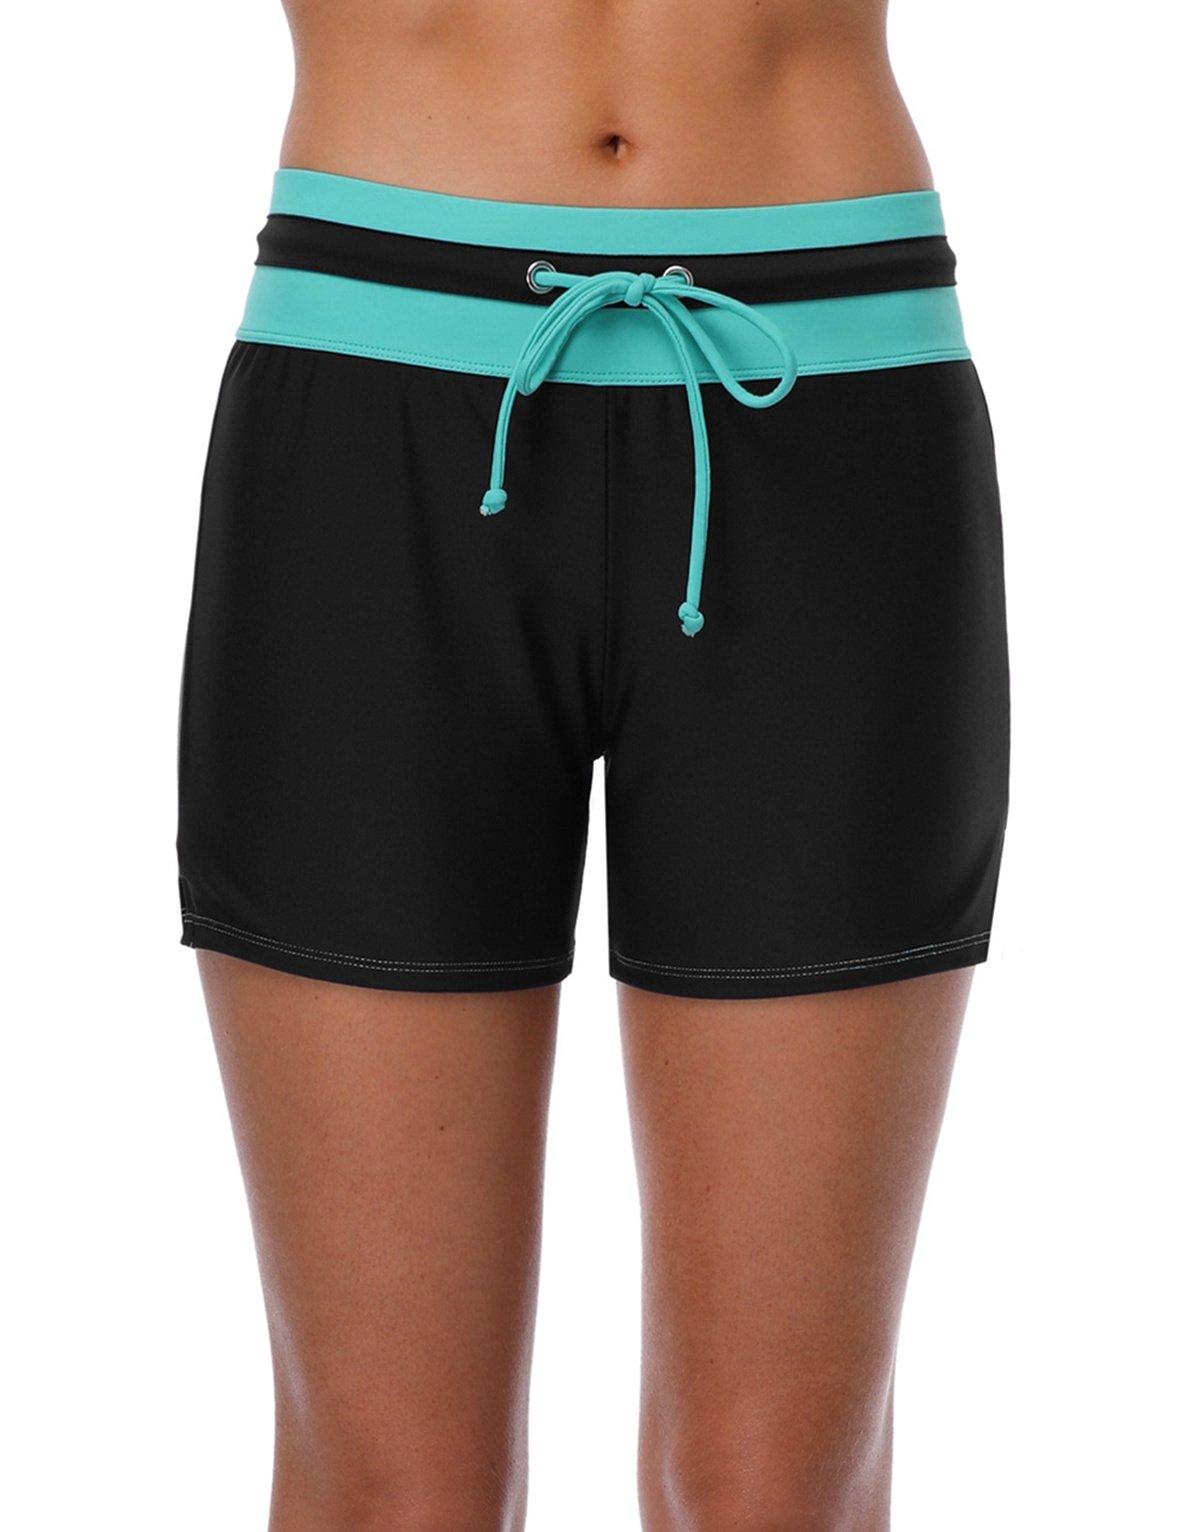 beautyin Ladies Swimming Short Board Short Boyleg Swimwear Bottoms Boardshort Swim L